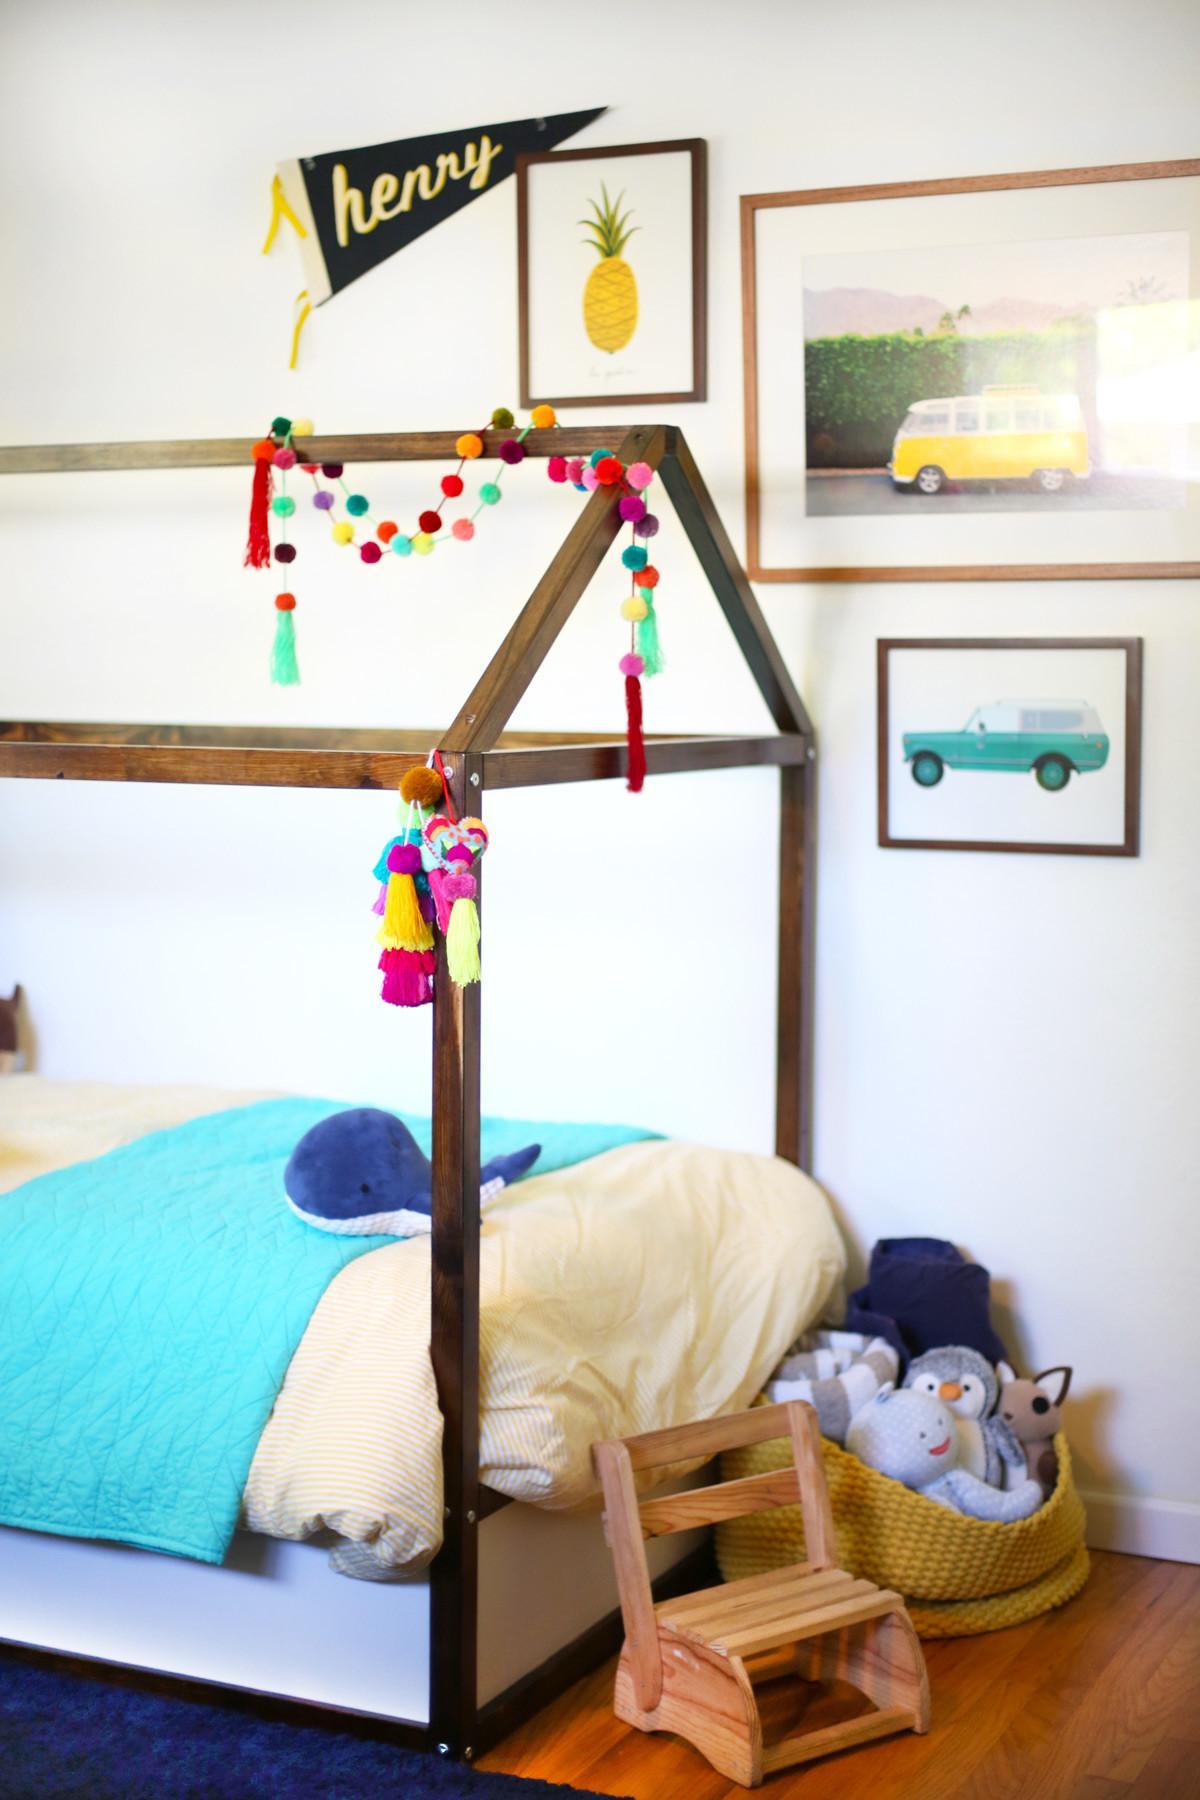 Full Size of Ikea Kura Hack Storage House Bed Montessori Hacks Pinterest Bunk Instructions Stairs Ideas Double Mesmerizing Diy Kids Room That Make Cute Minimalist Wohnzimmer Kura Hack